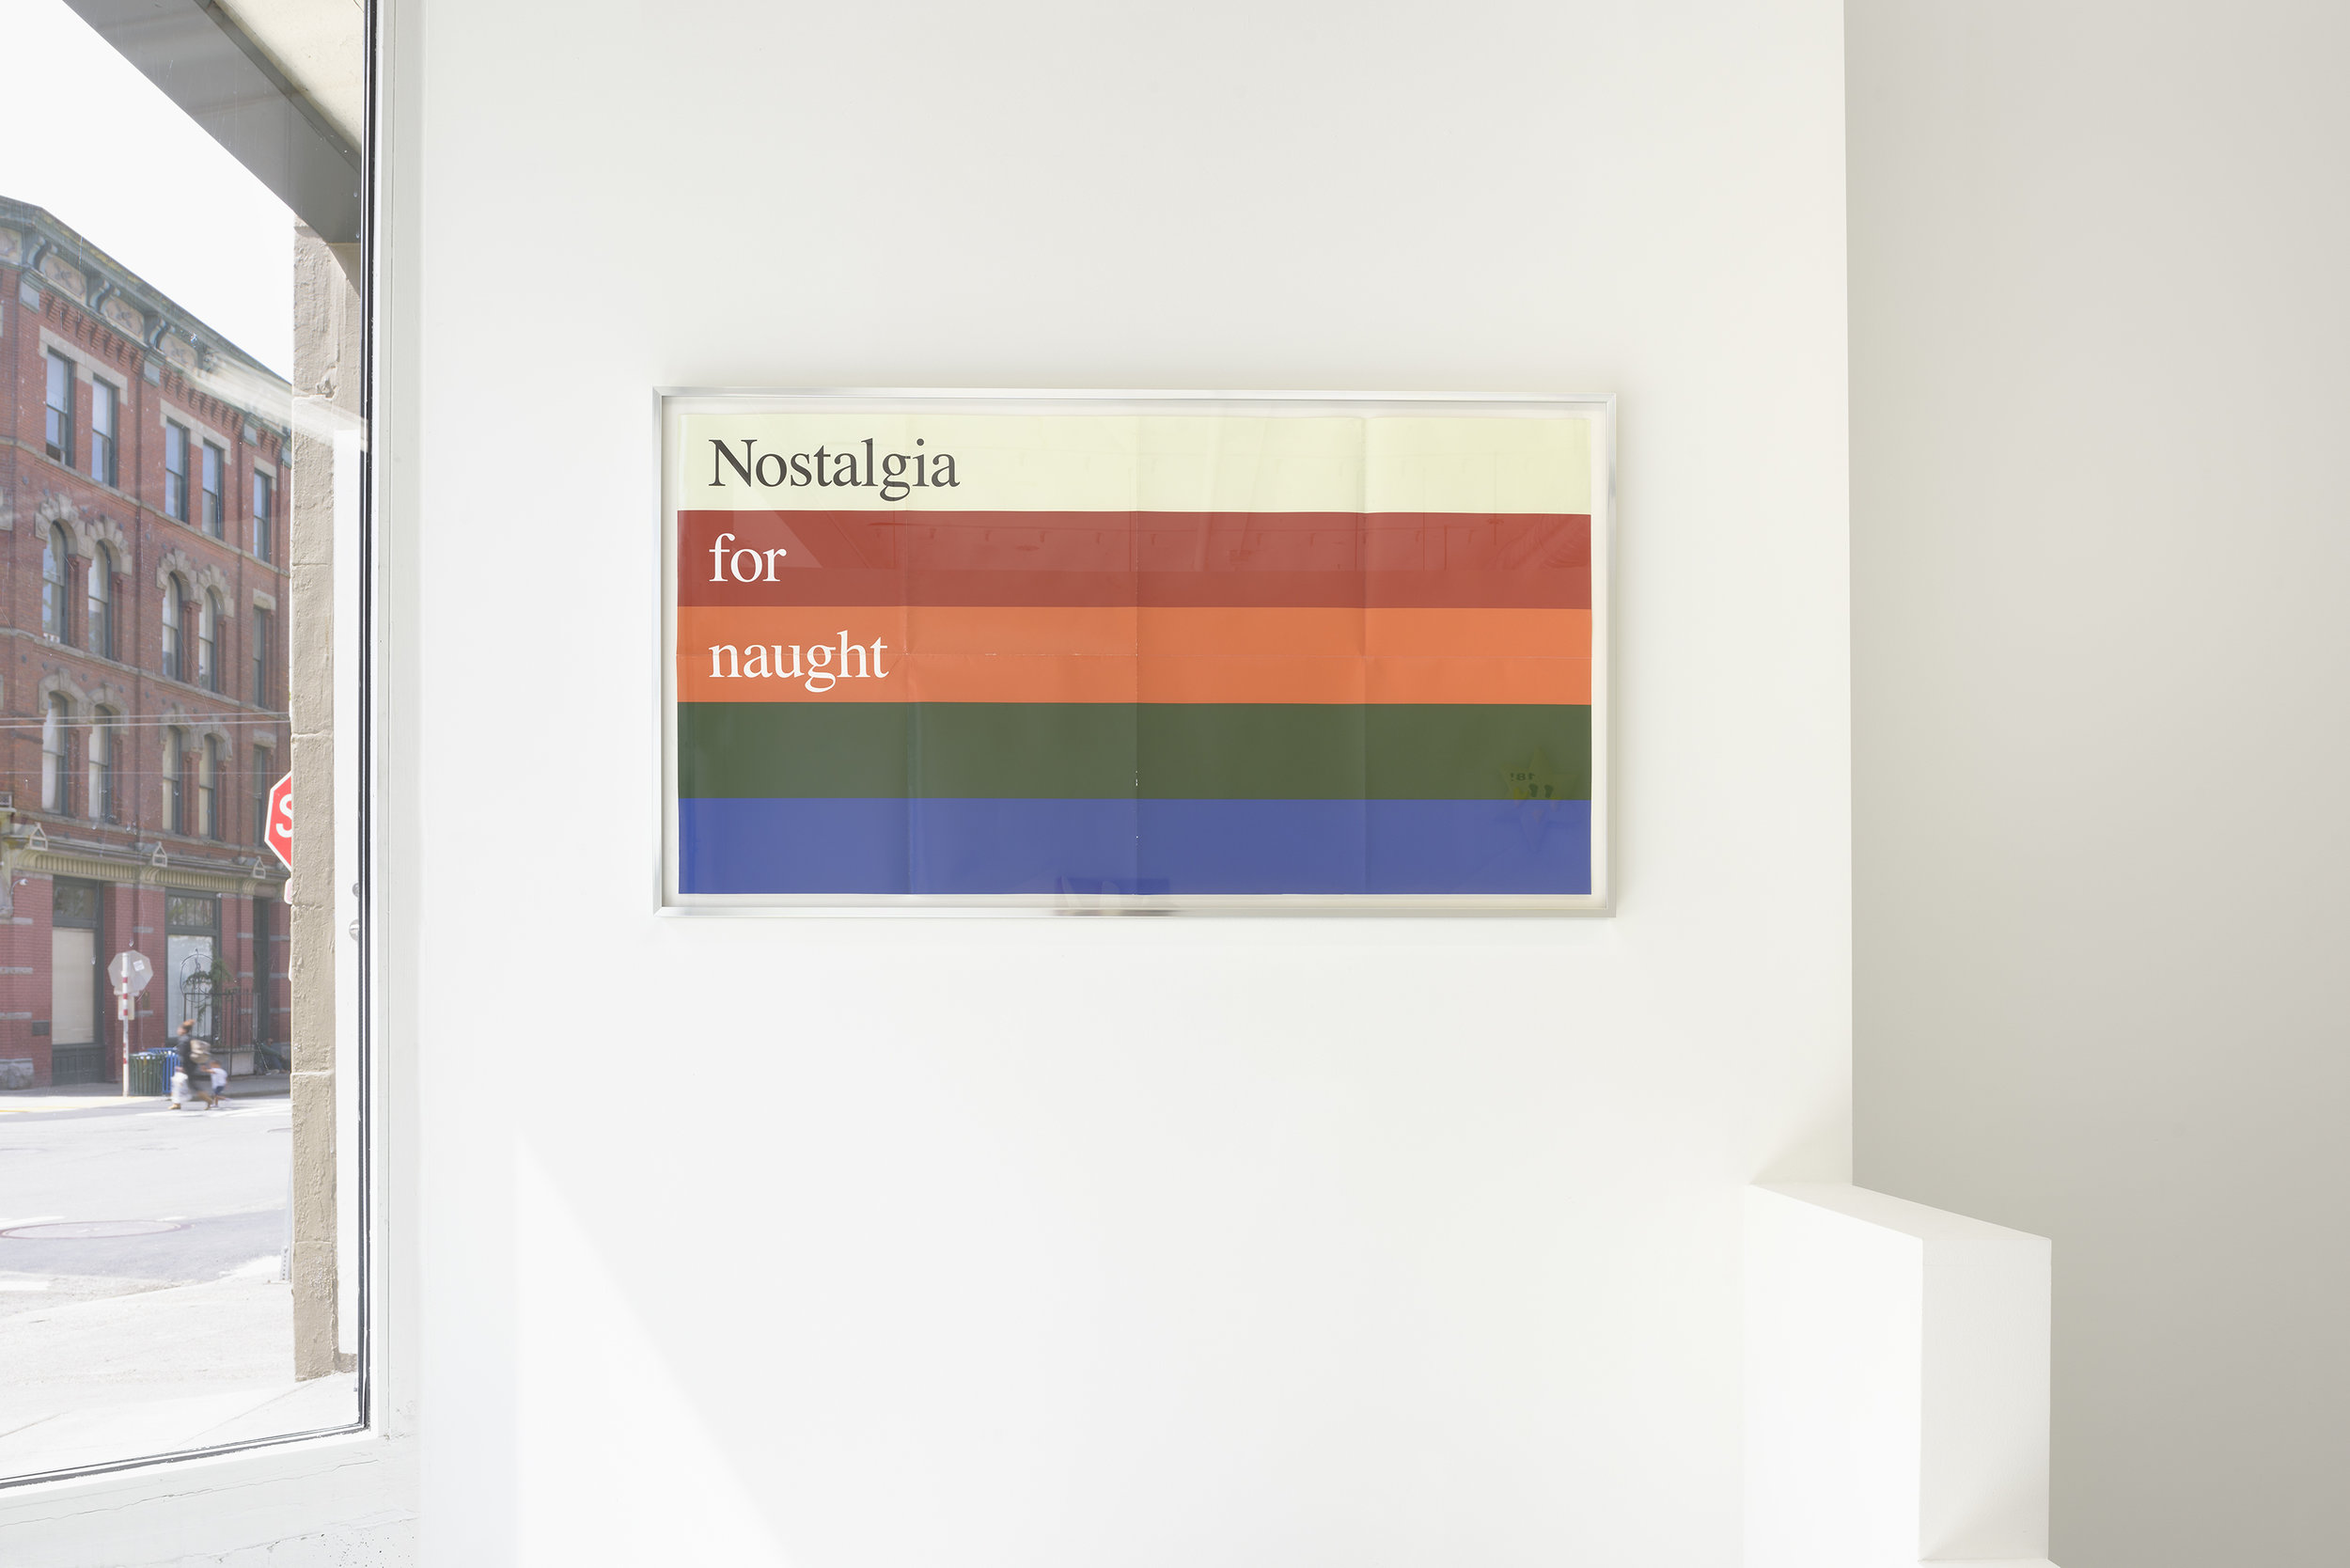 Dori Hana Scherer, Nostalgia for Naught , 2018,aged poster, aluminum frame 45 x 24.5 inches,installation view, Specialist, Seattle WA